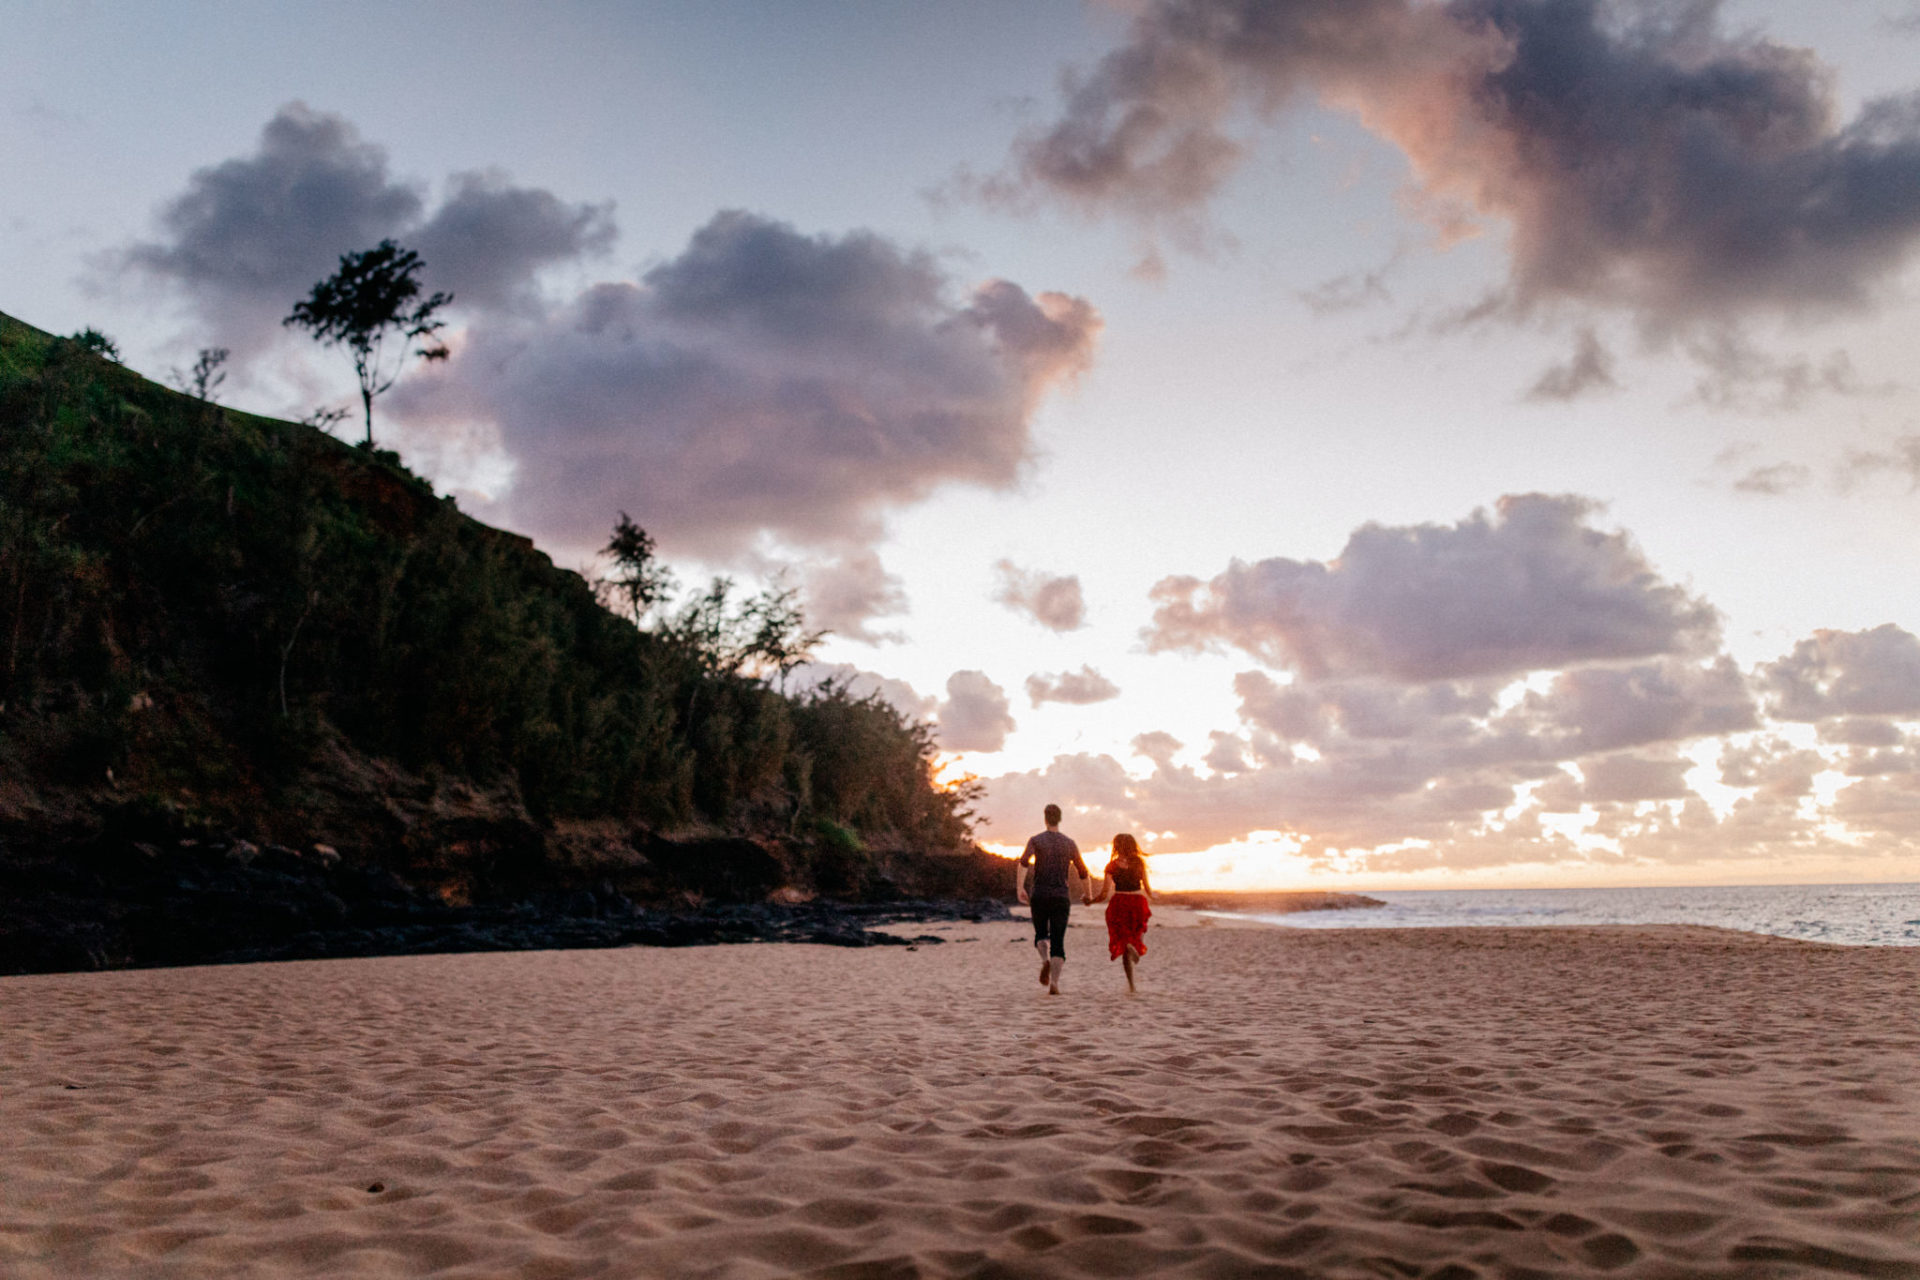 Hawaii Hochzeit-destination wedding kauai-flitterwochen-tropische Insel-Honeymoonfotos